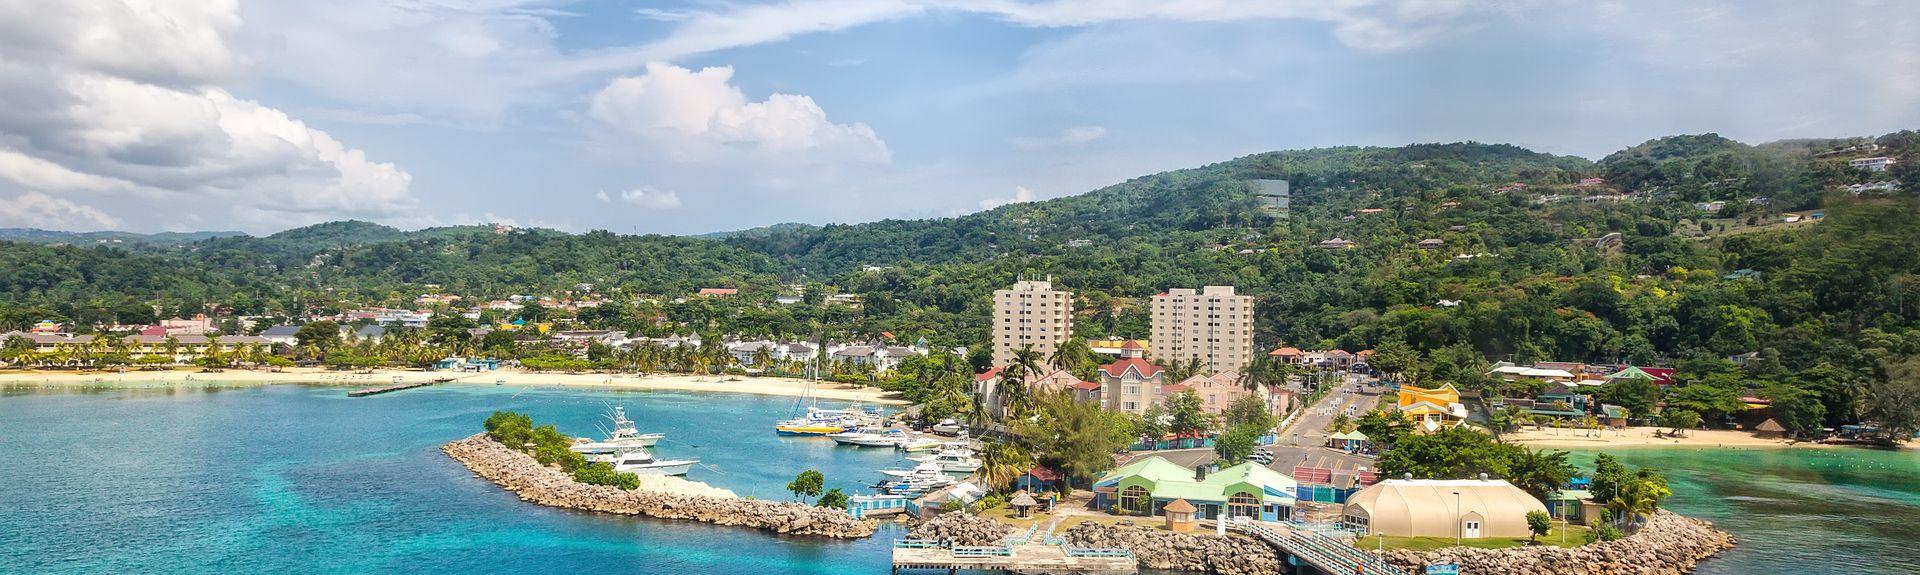 Ocho Rios, Middlesex County, Jamaica